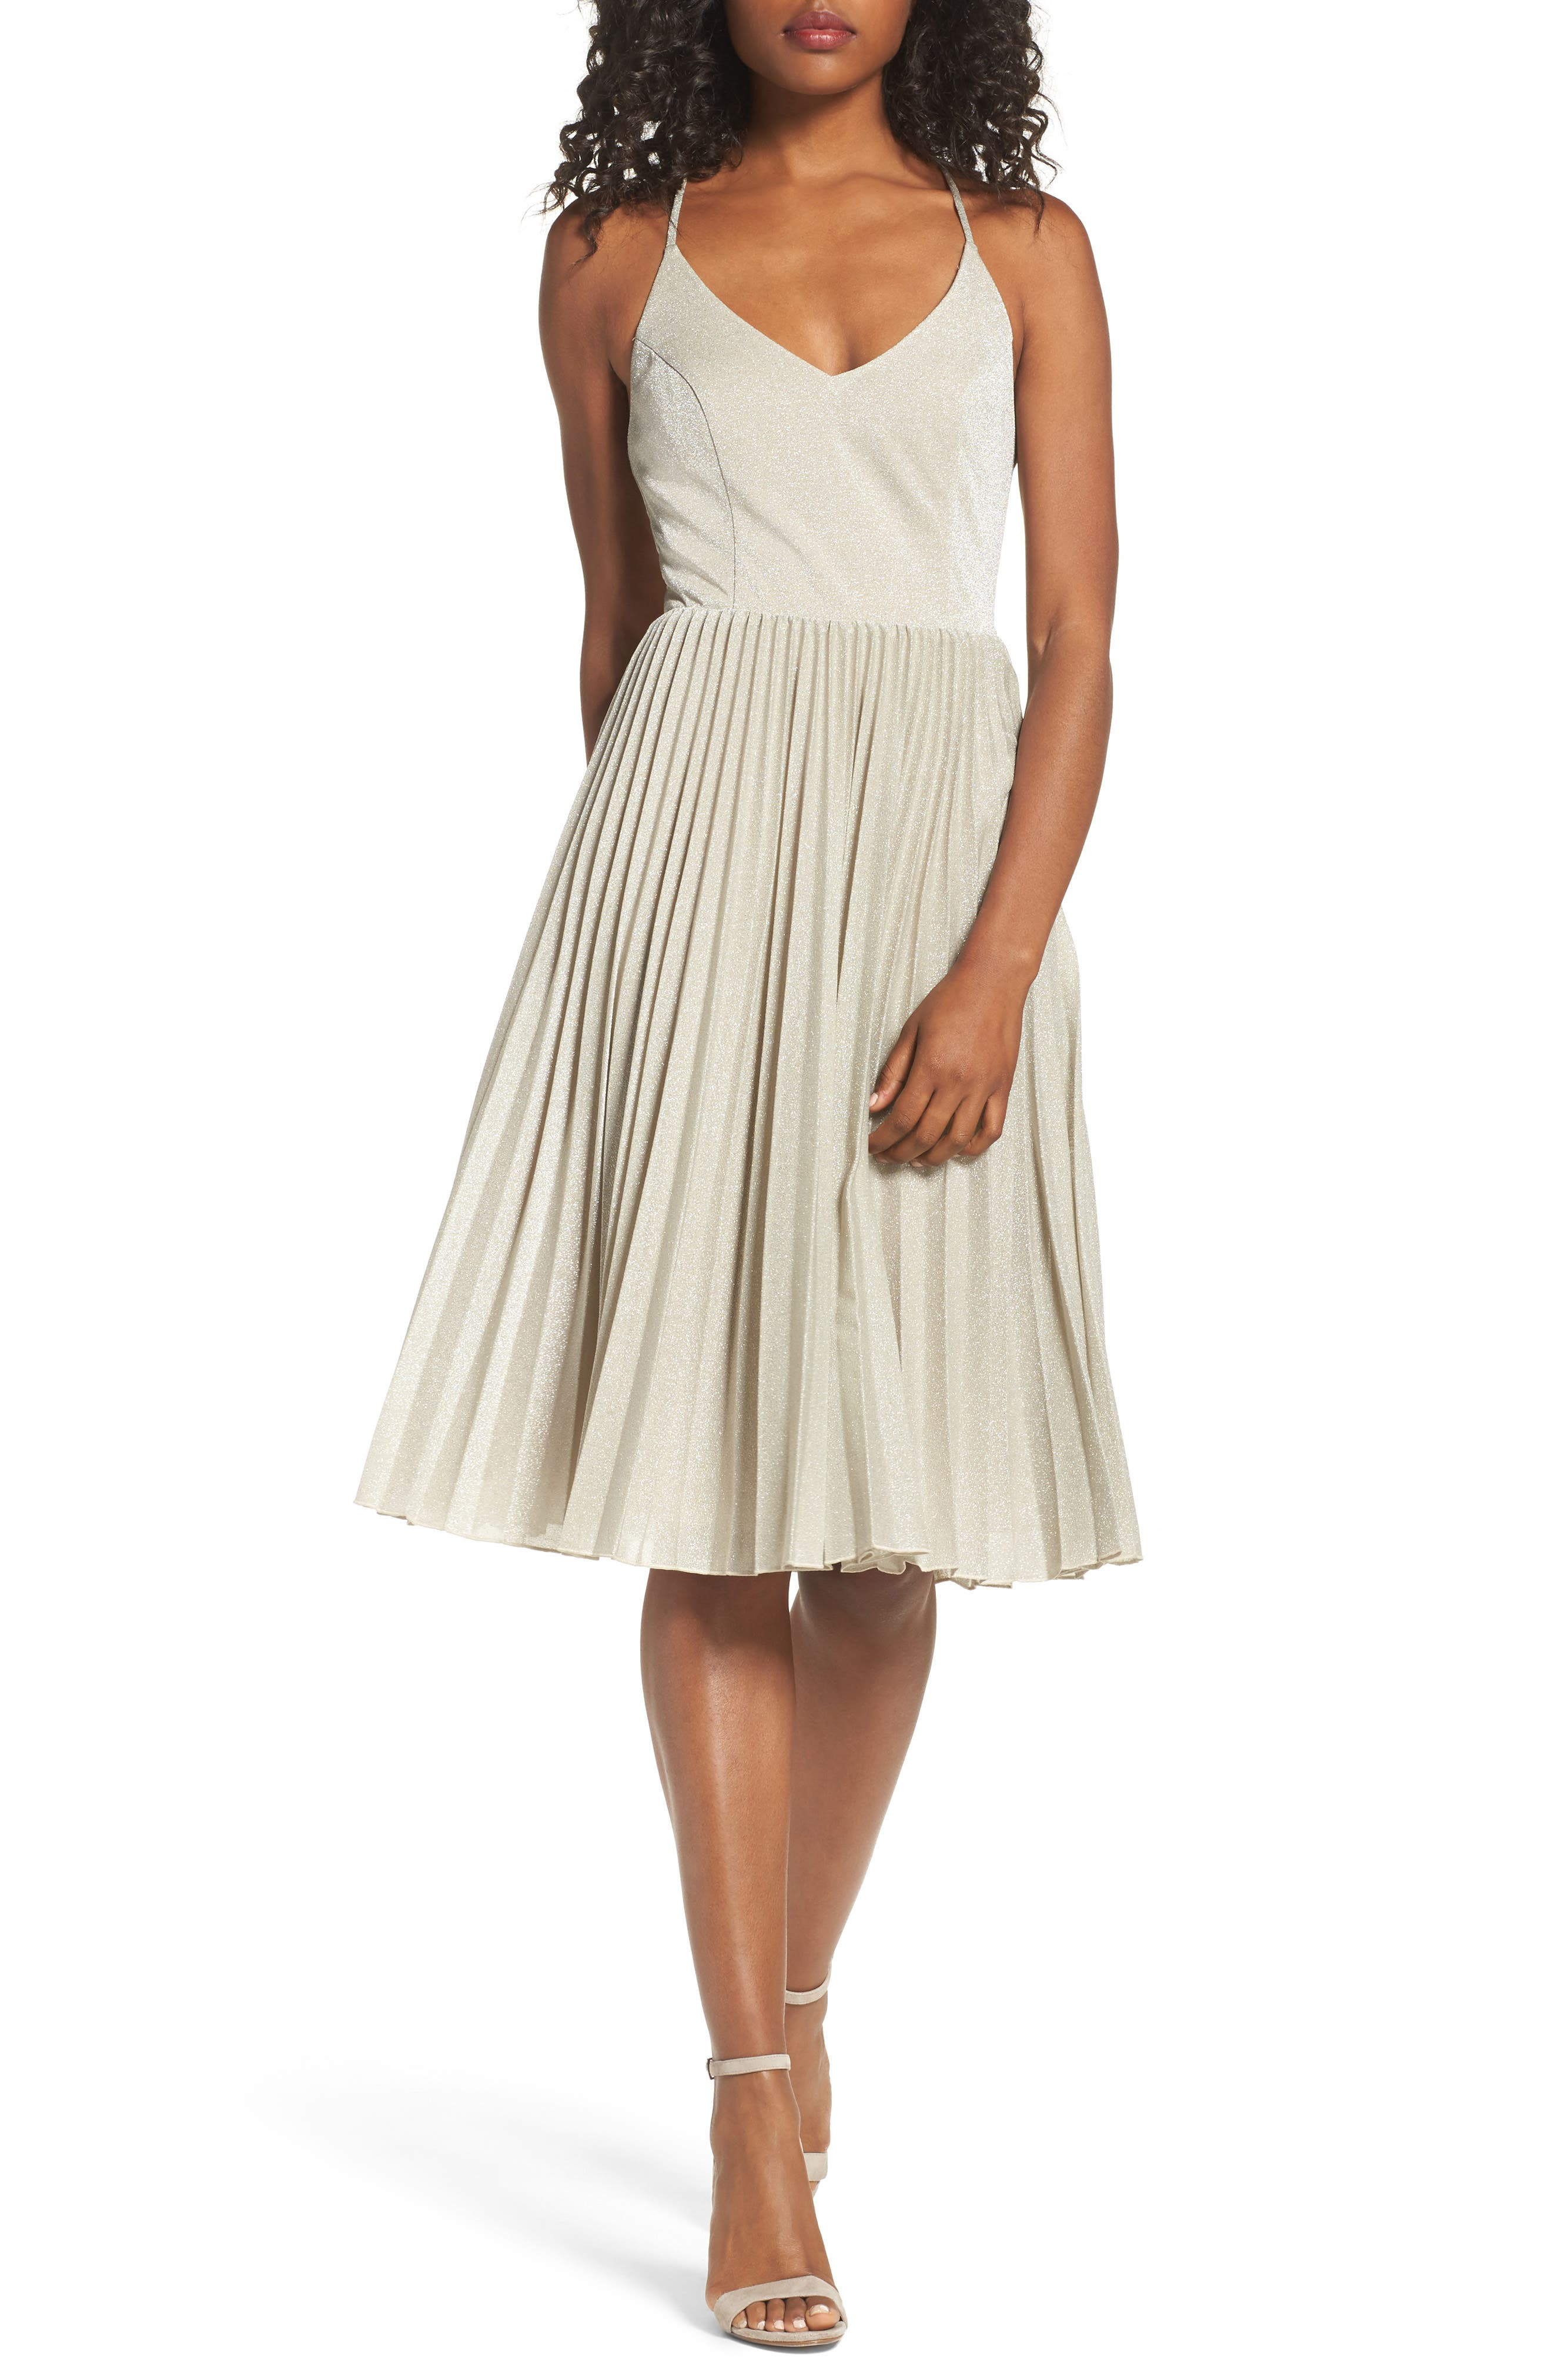 Alternate Image 1 Selected - Adelyn Rae Jolene Fit & Flare Dress